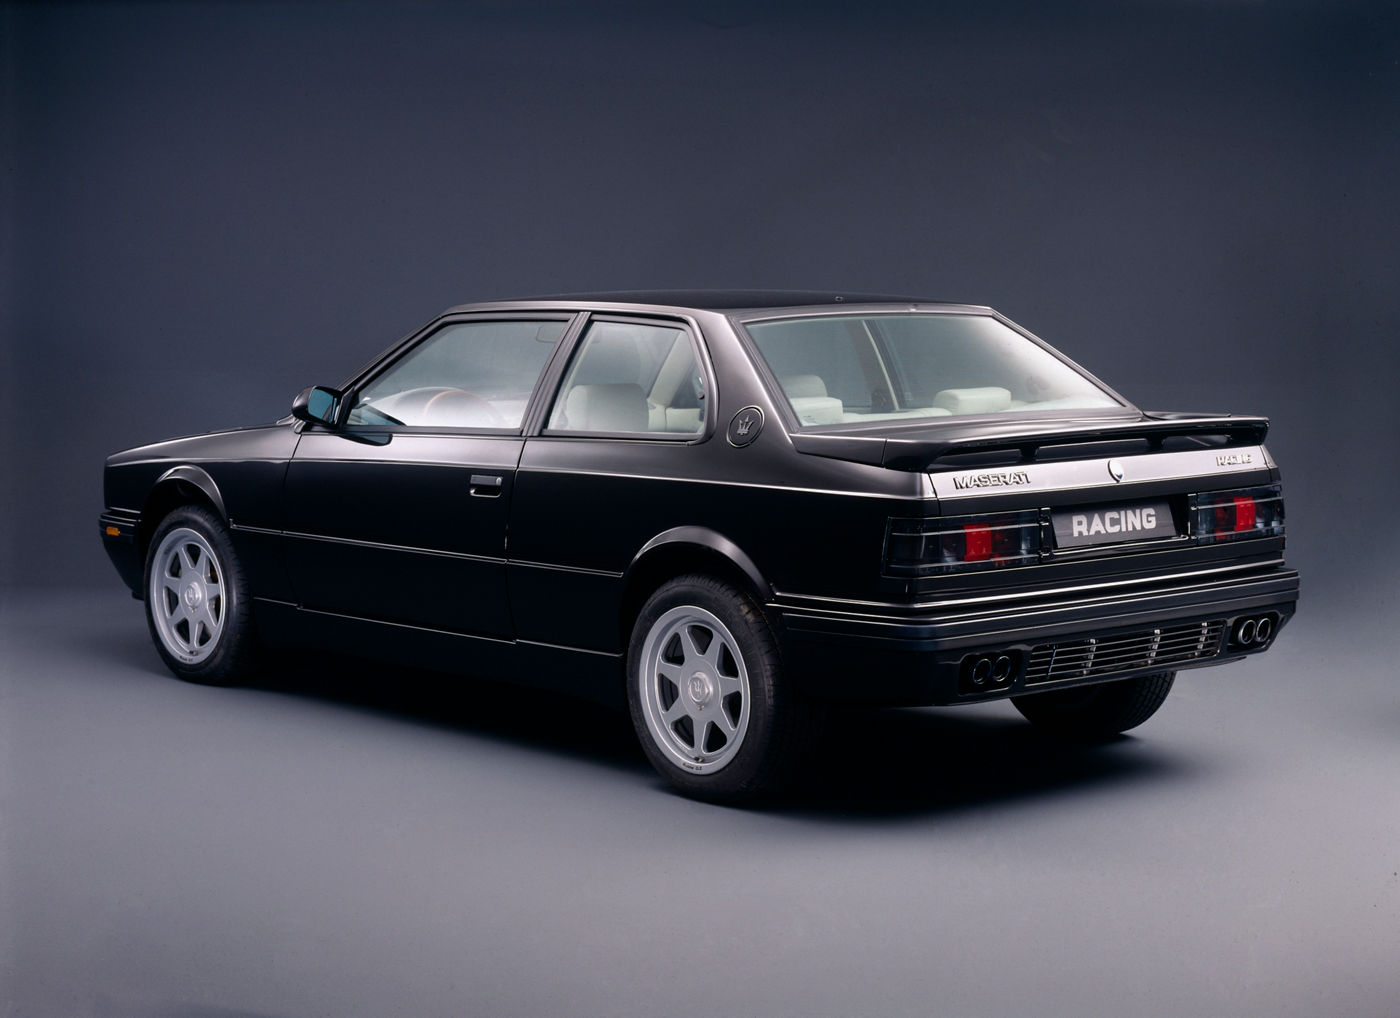 1991 Maserati Racing - rear of the classic sports car model in black